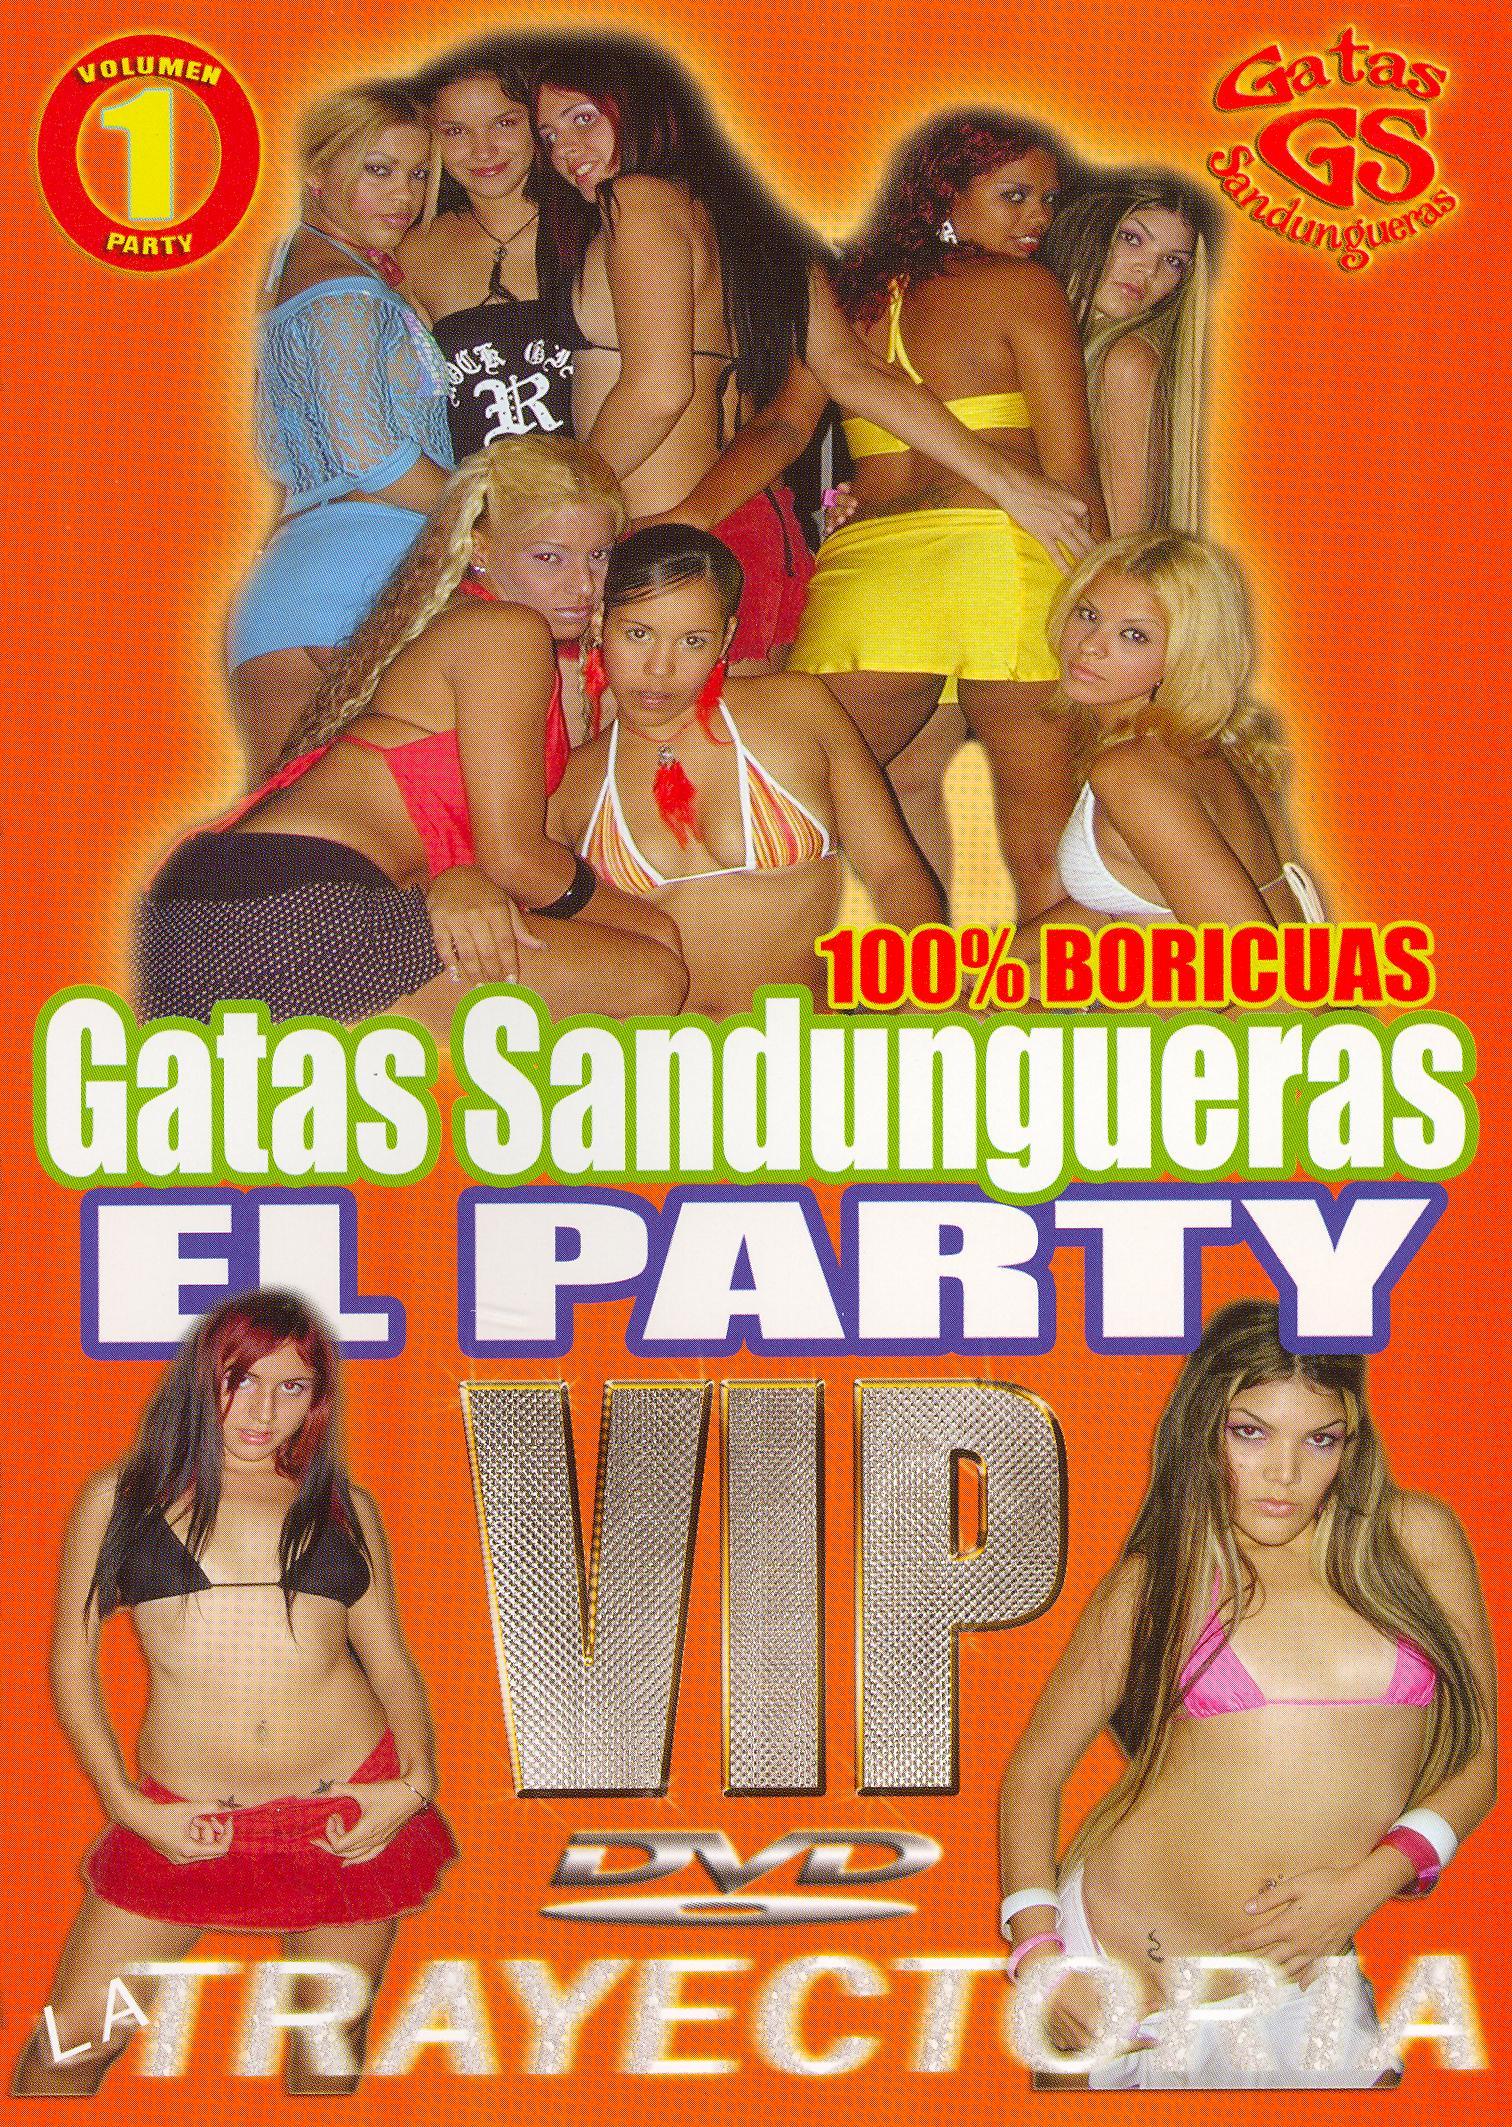 Gatas Sandungueras: VIP Party